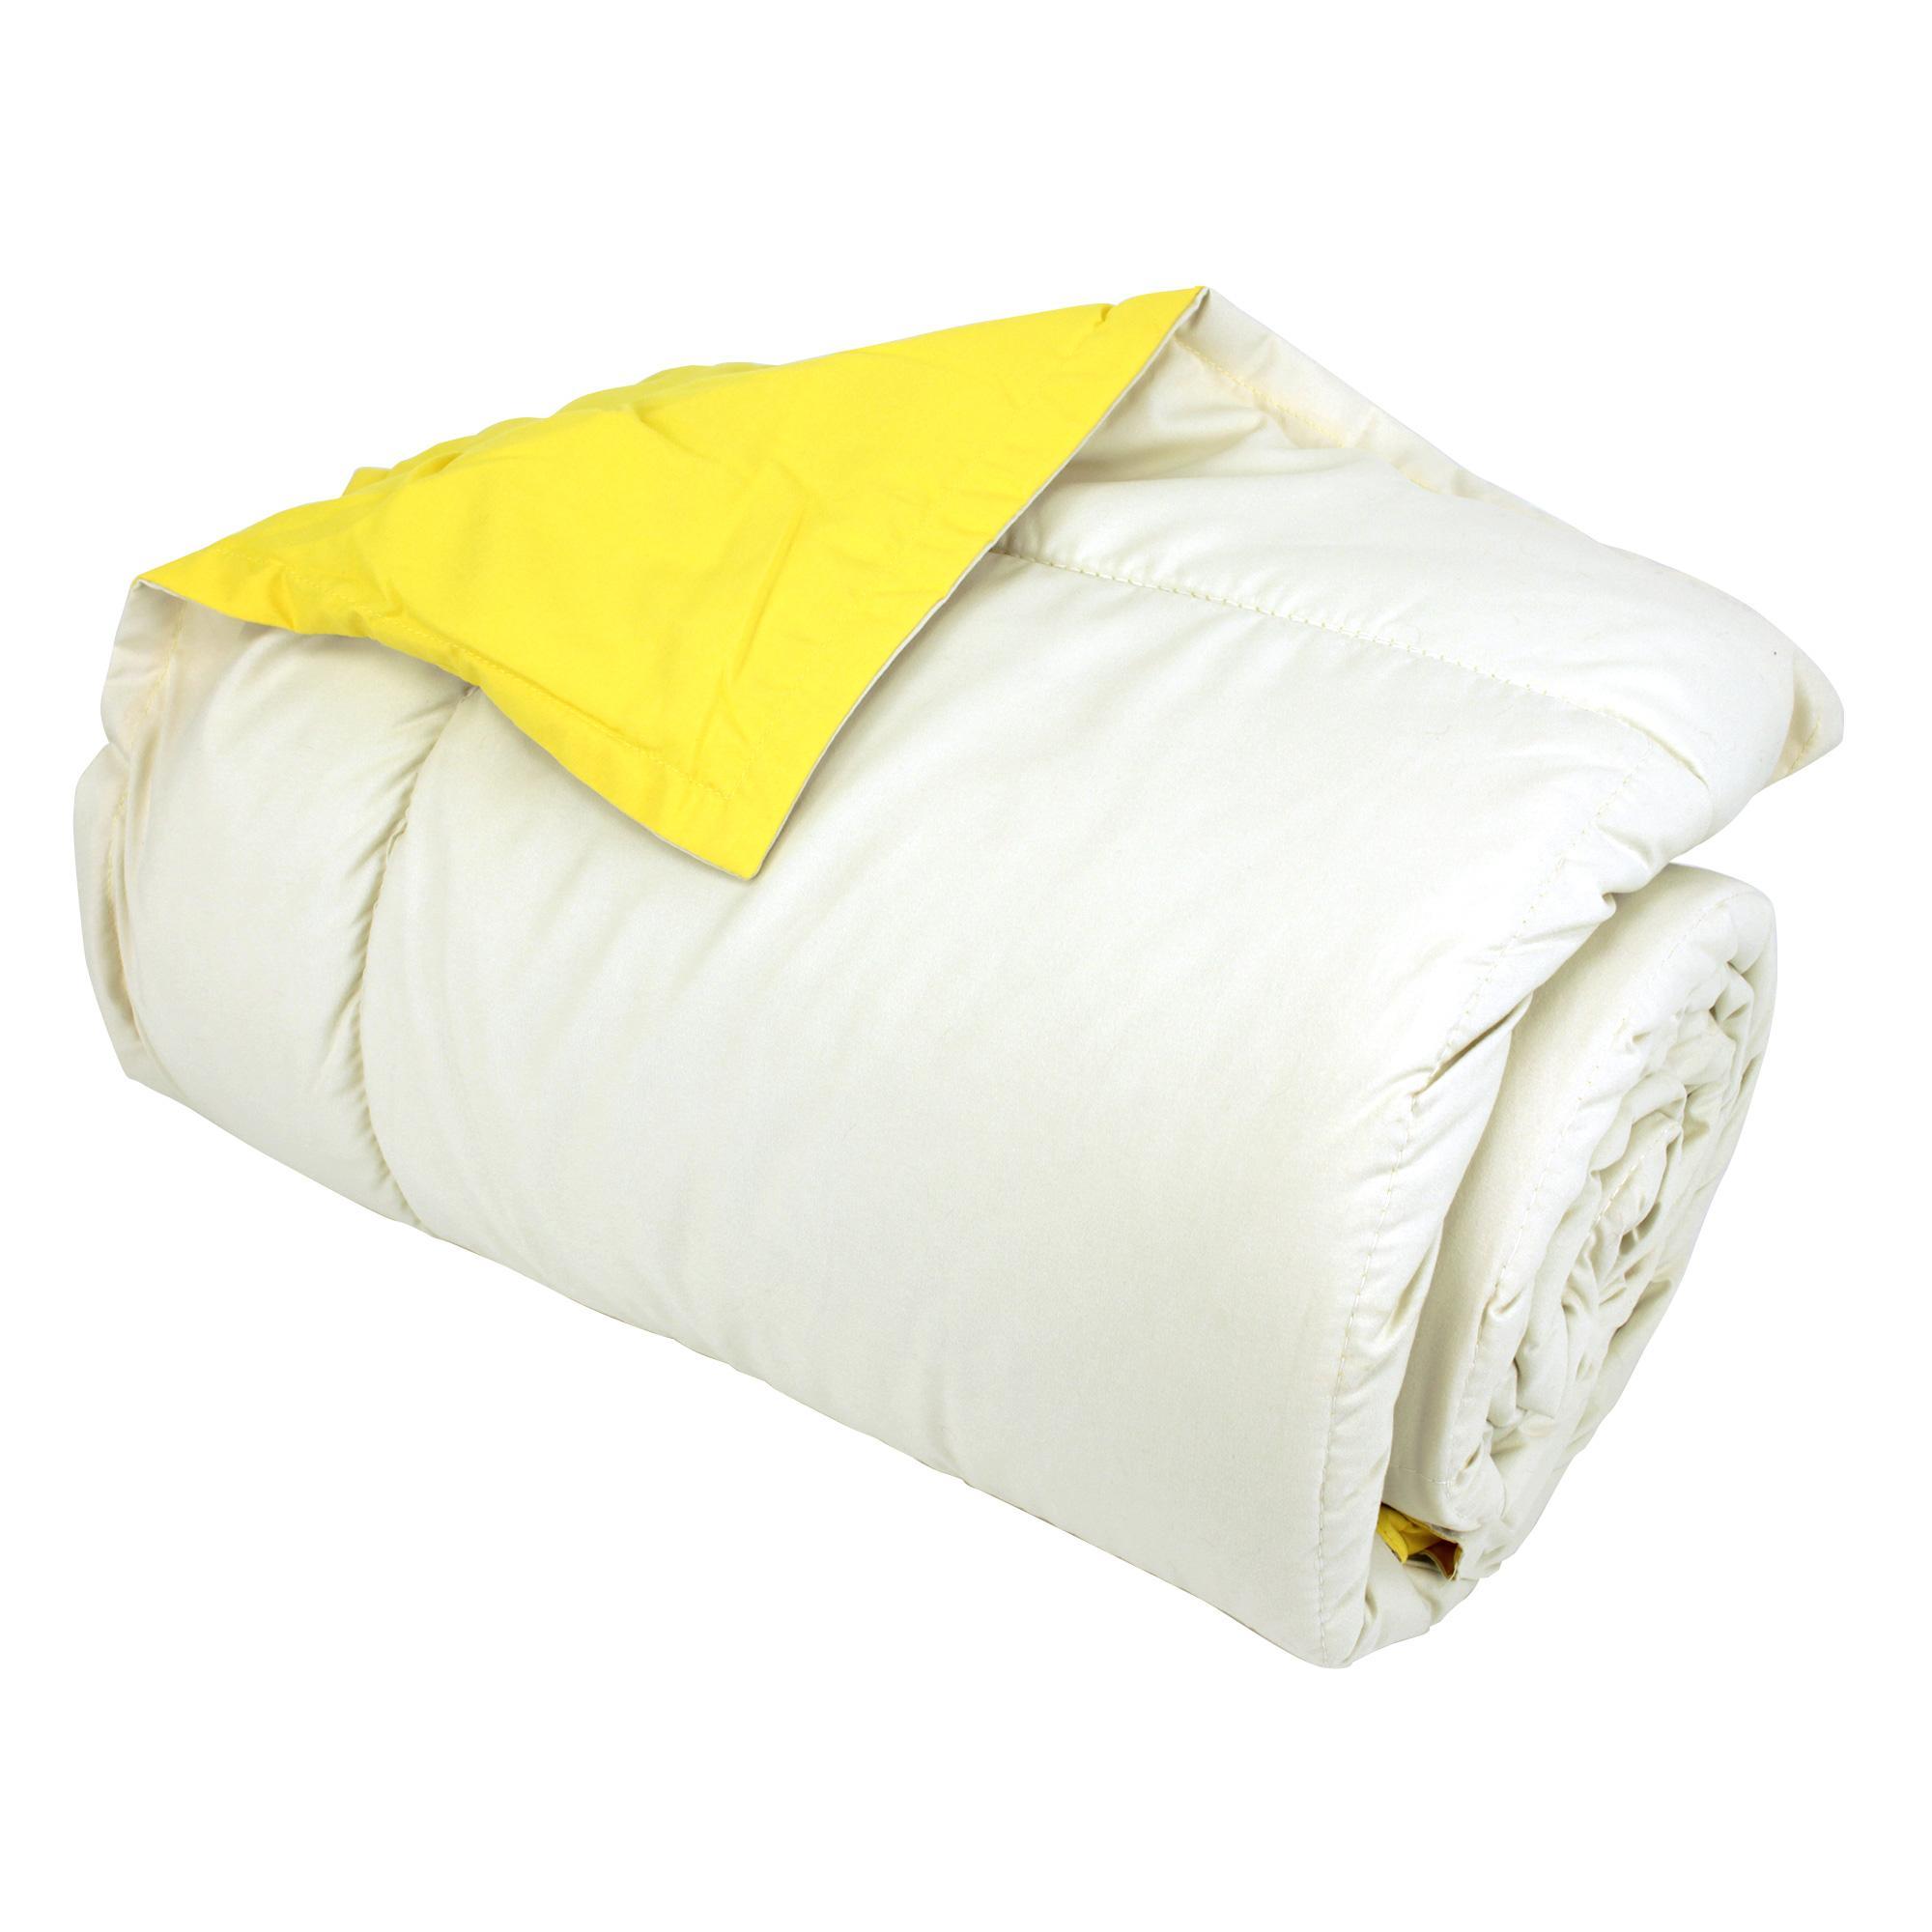 dessus de lit 160x240 microfibre frisbee bicolore blanc cr me jaune ebay. Black Bedroom Furniture Sets. Home Design Ideas